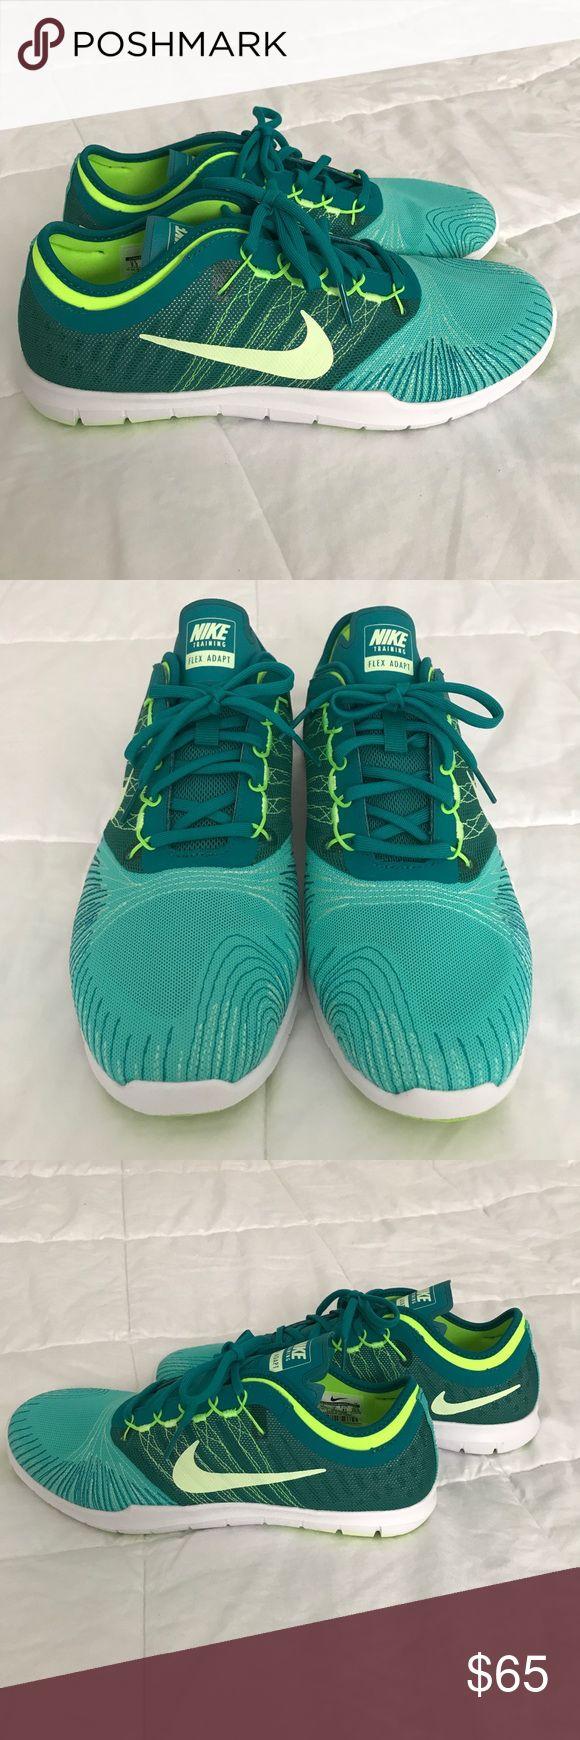 Women's Nike Flex Adapt Training Shoes. Size 9.5 Brand New. Designed for Training. Nike Shoes